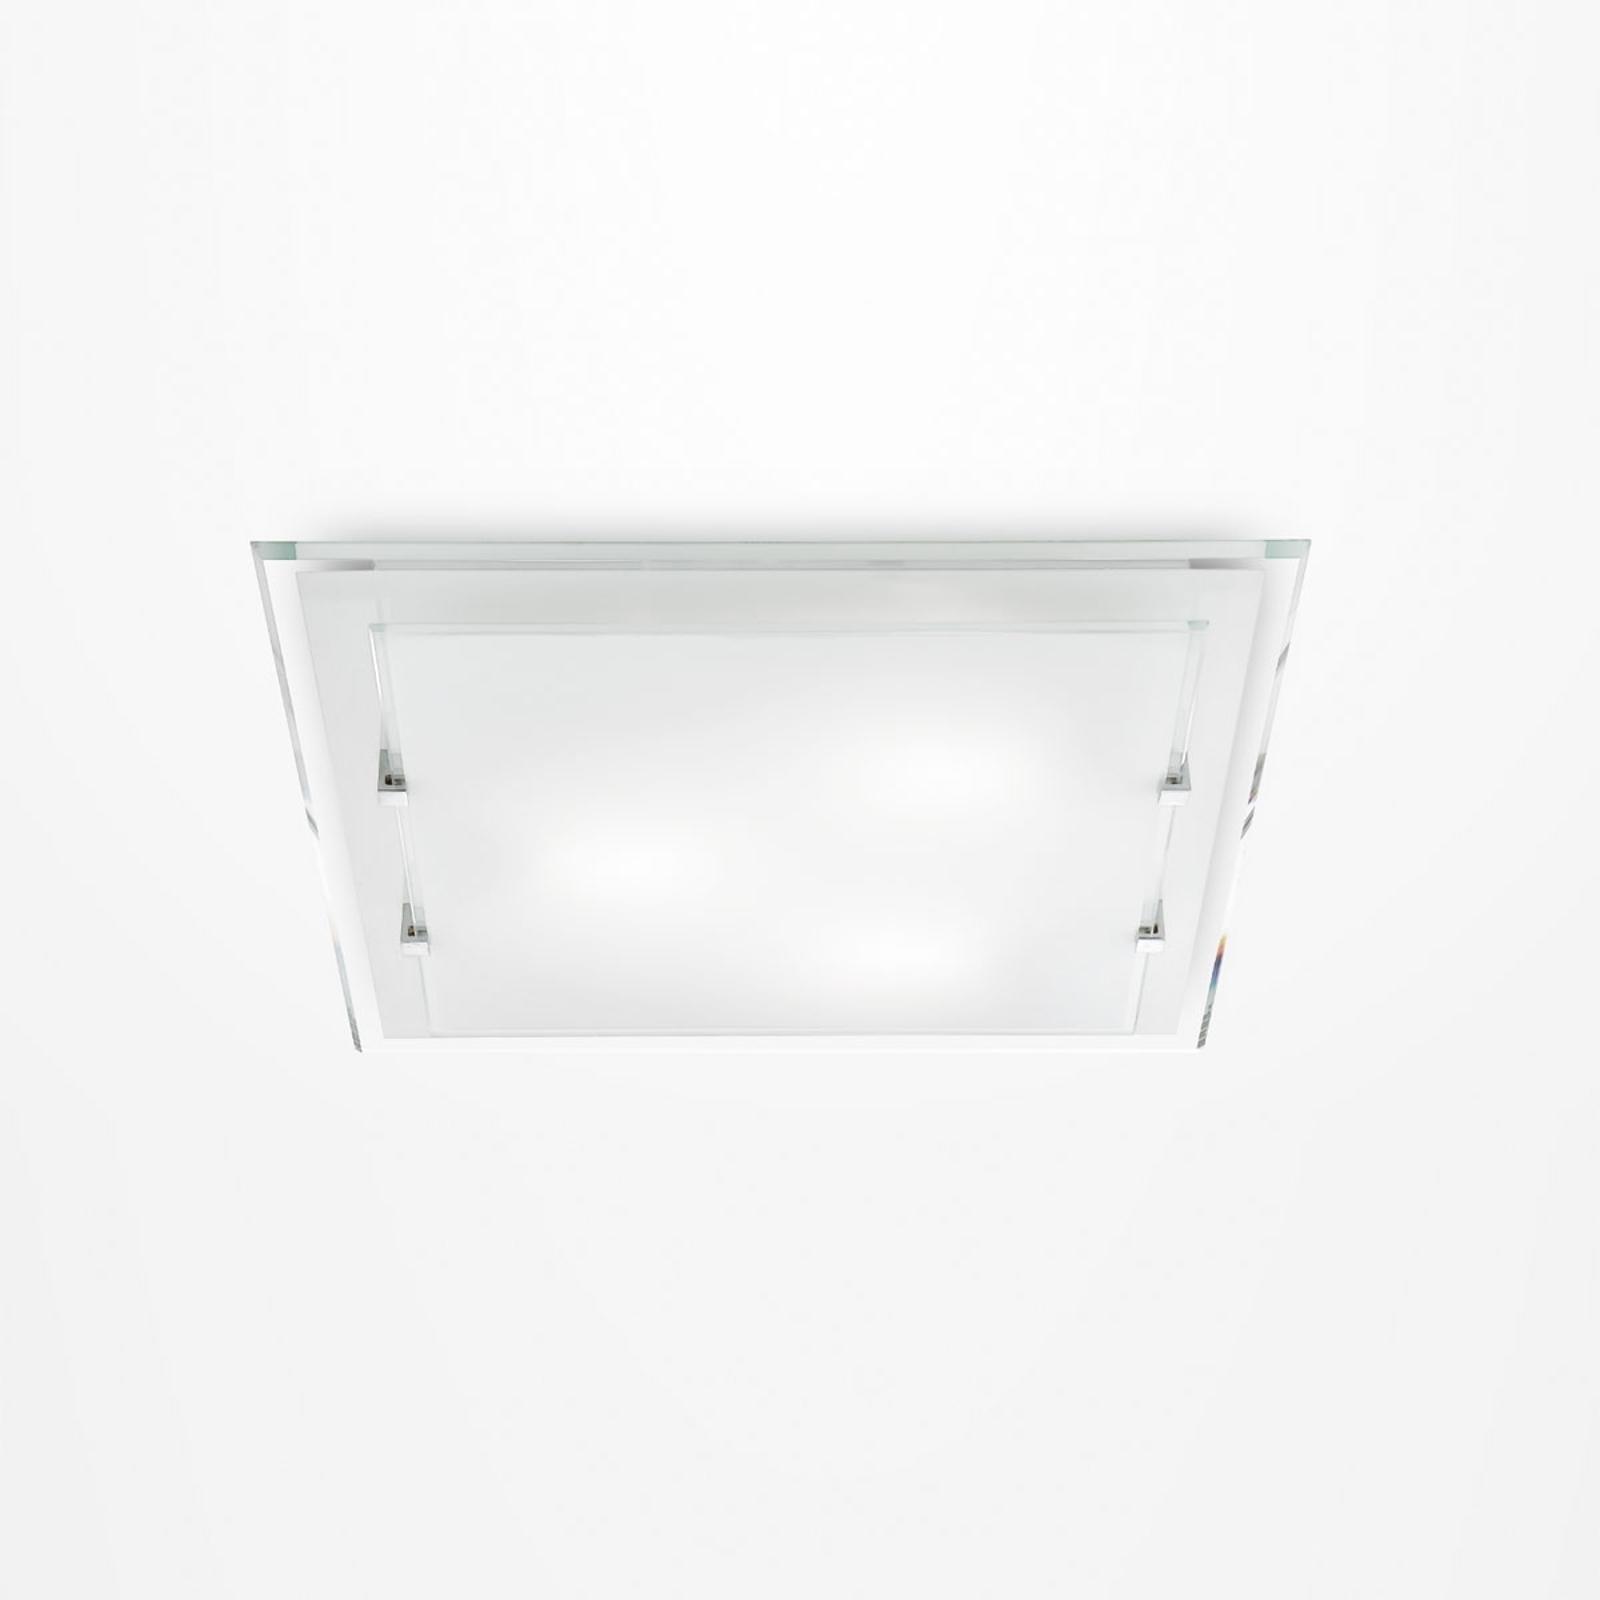 Prostokątna lampa sufitowa Victoria, 30 cm x 30 cm